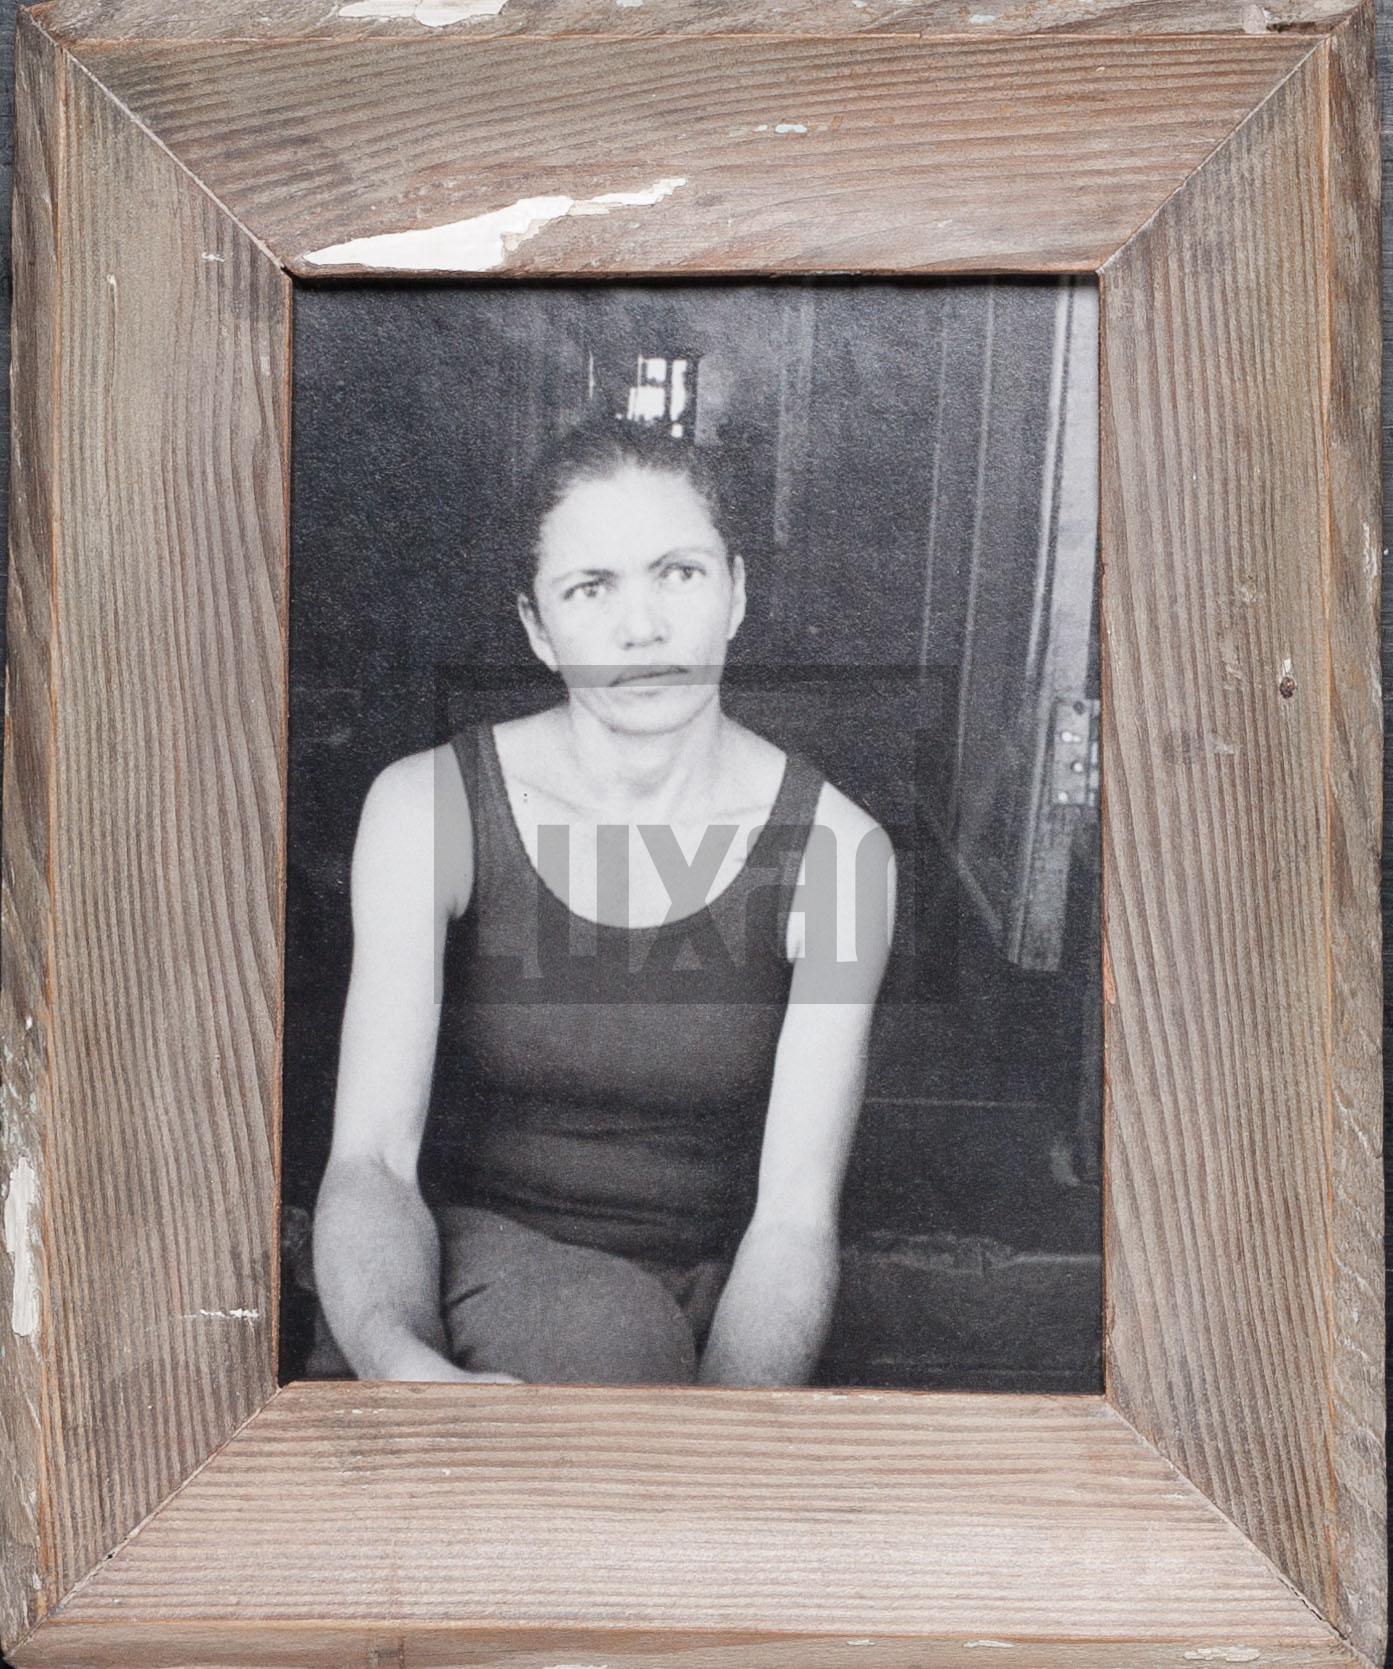 Altholz-Bilderrahmen für 15 x 20 cm große Fotos